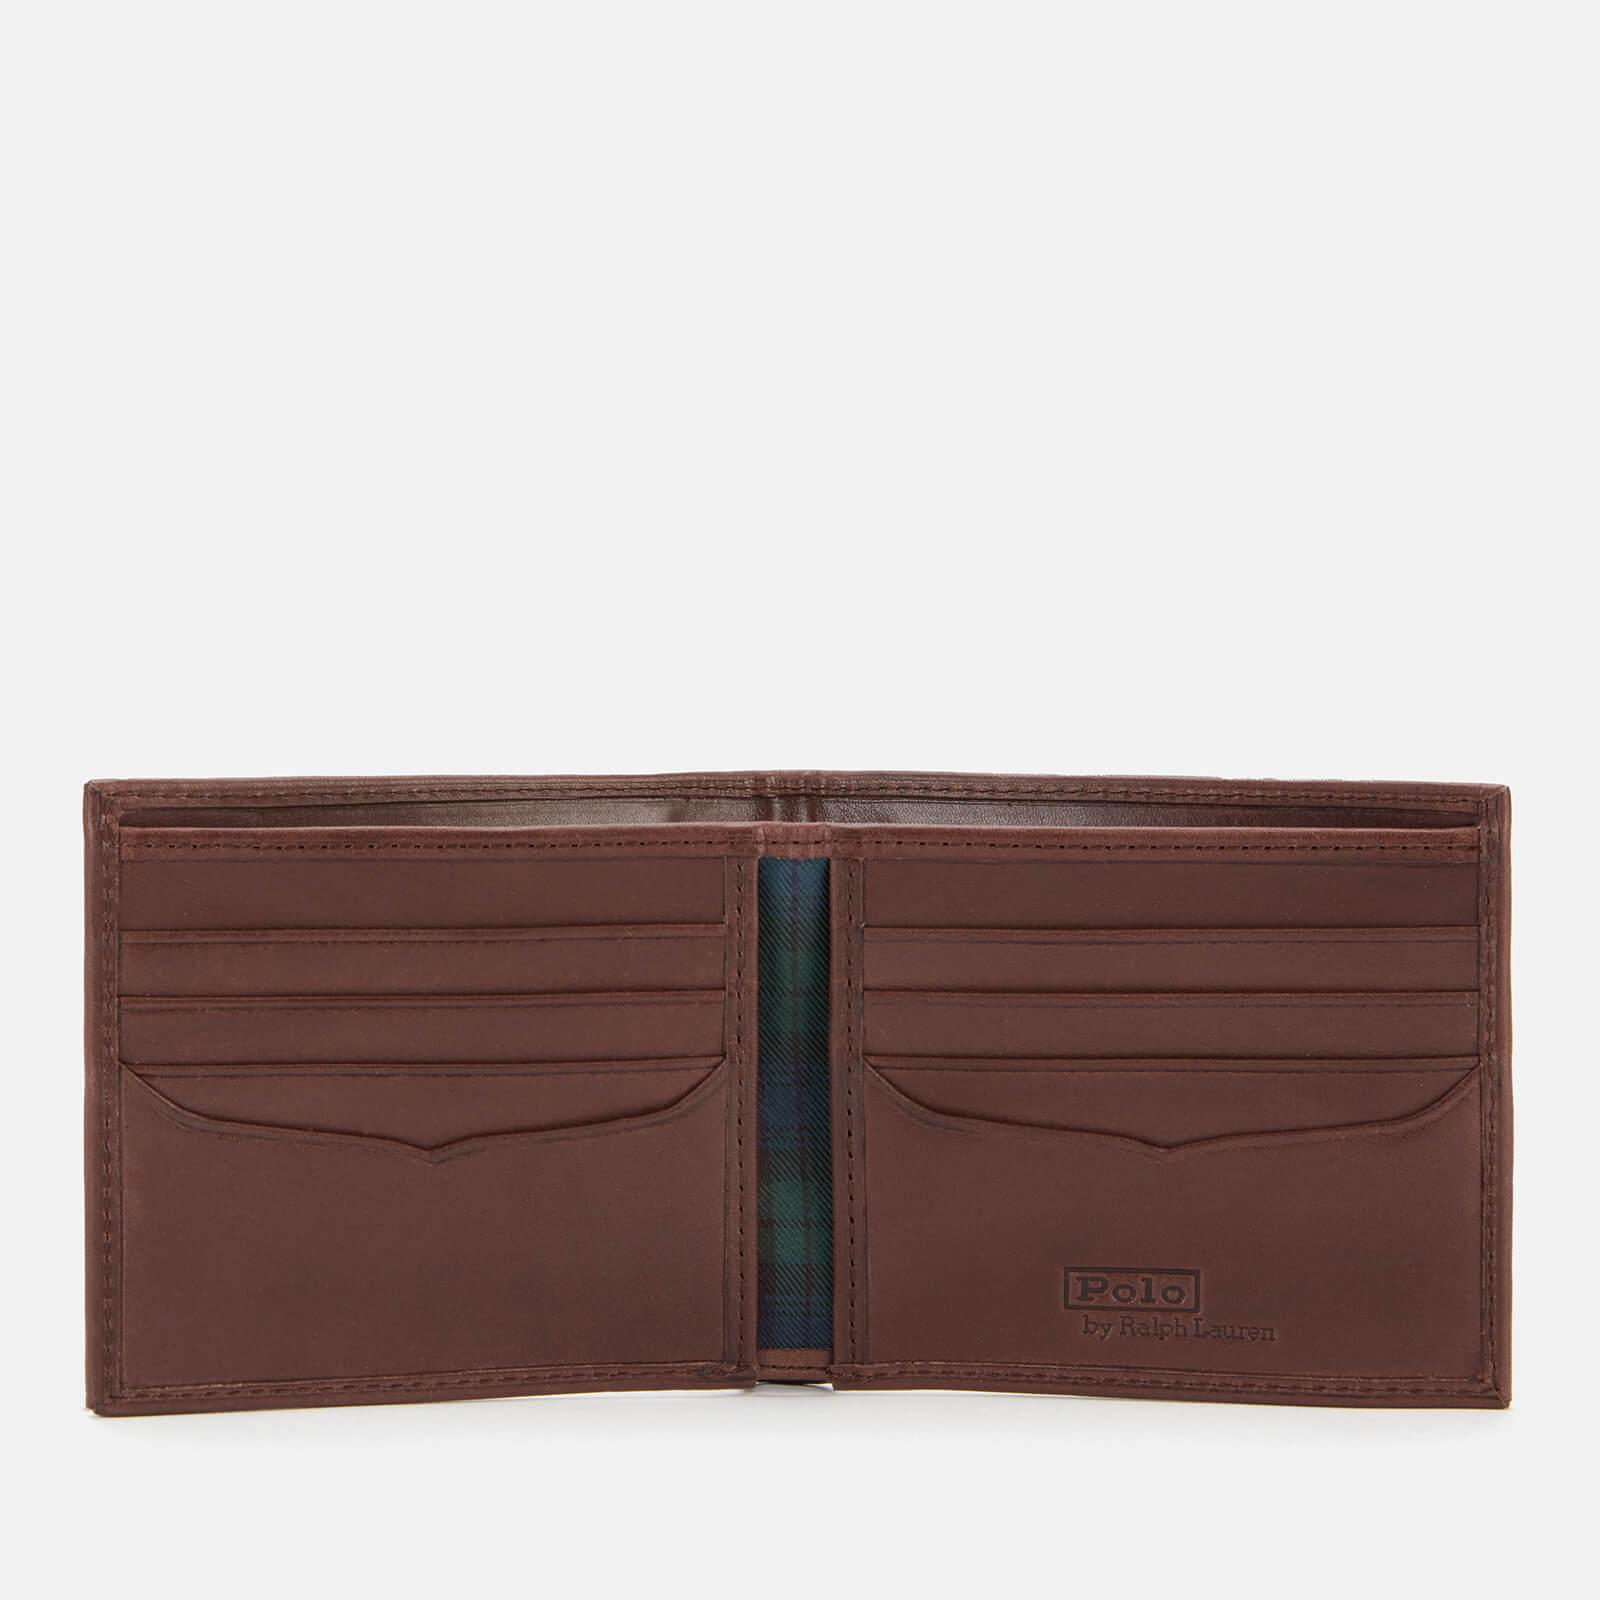 polo ralph lauren men's smooth leather tartan wallet - navy